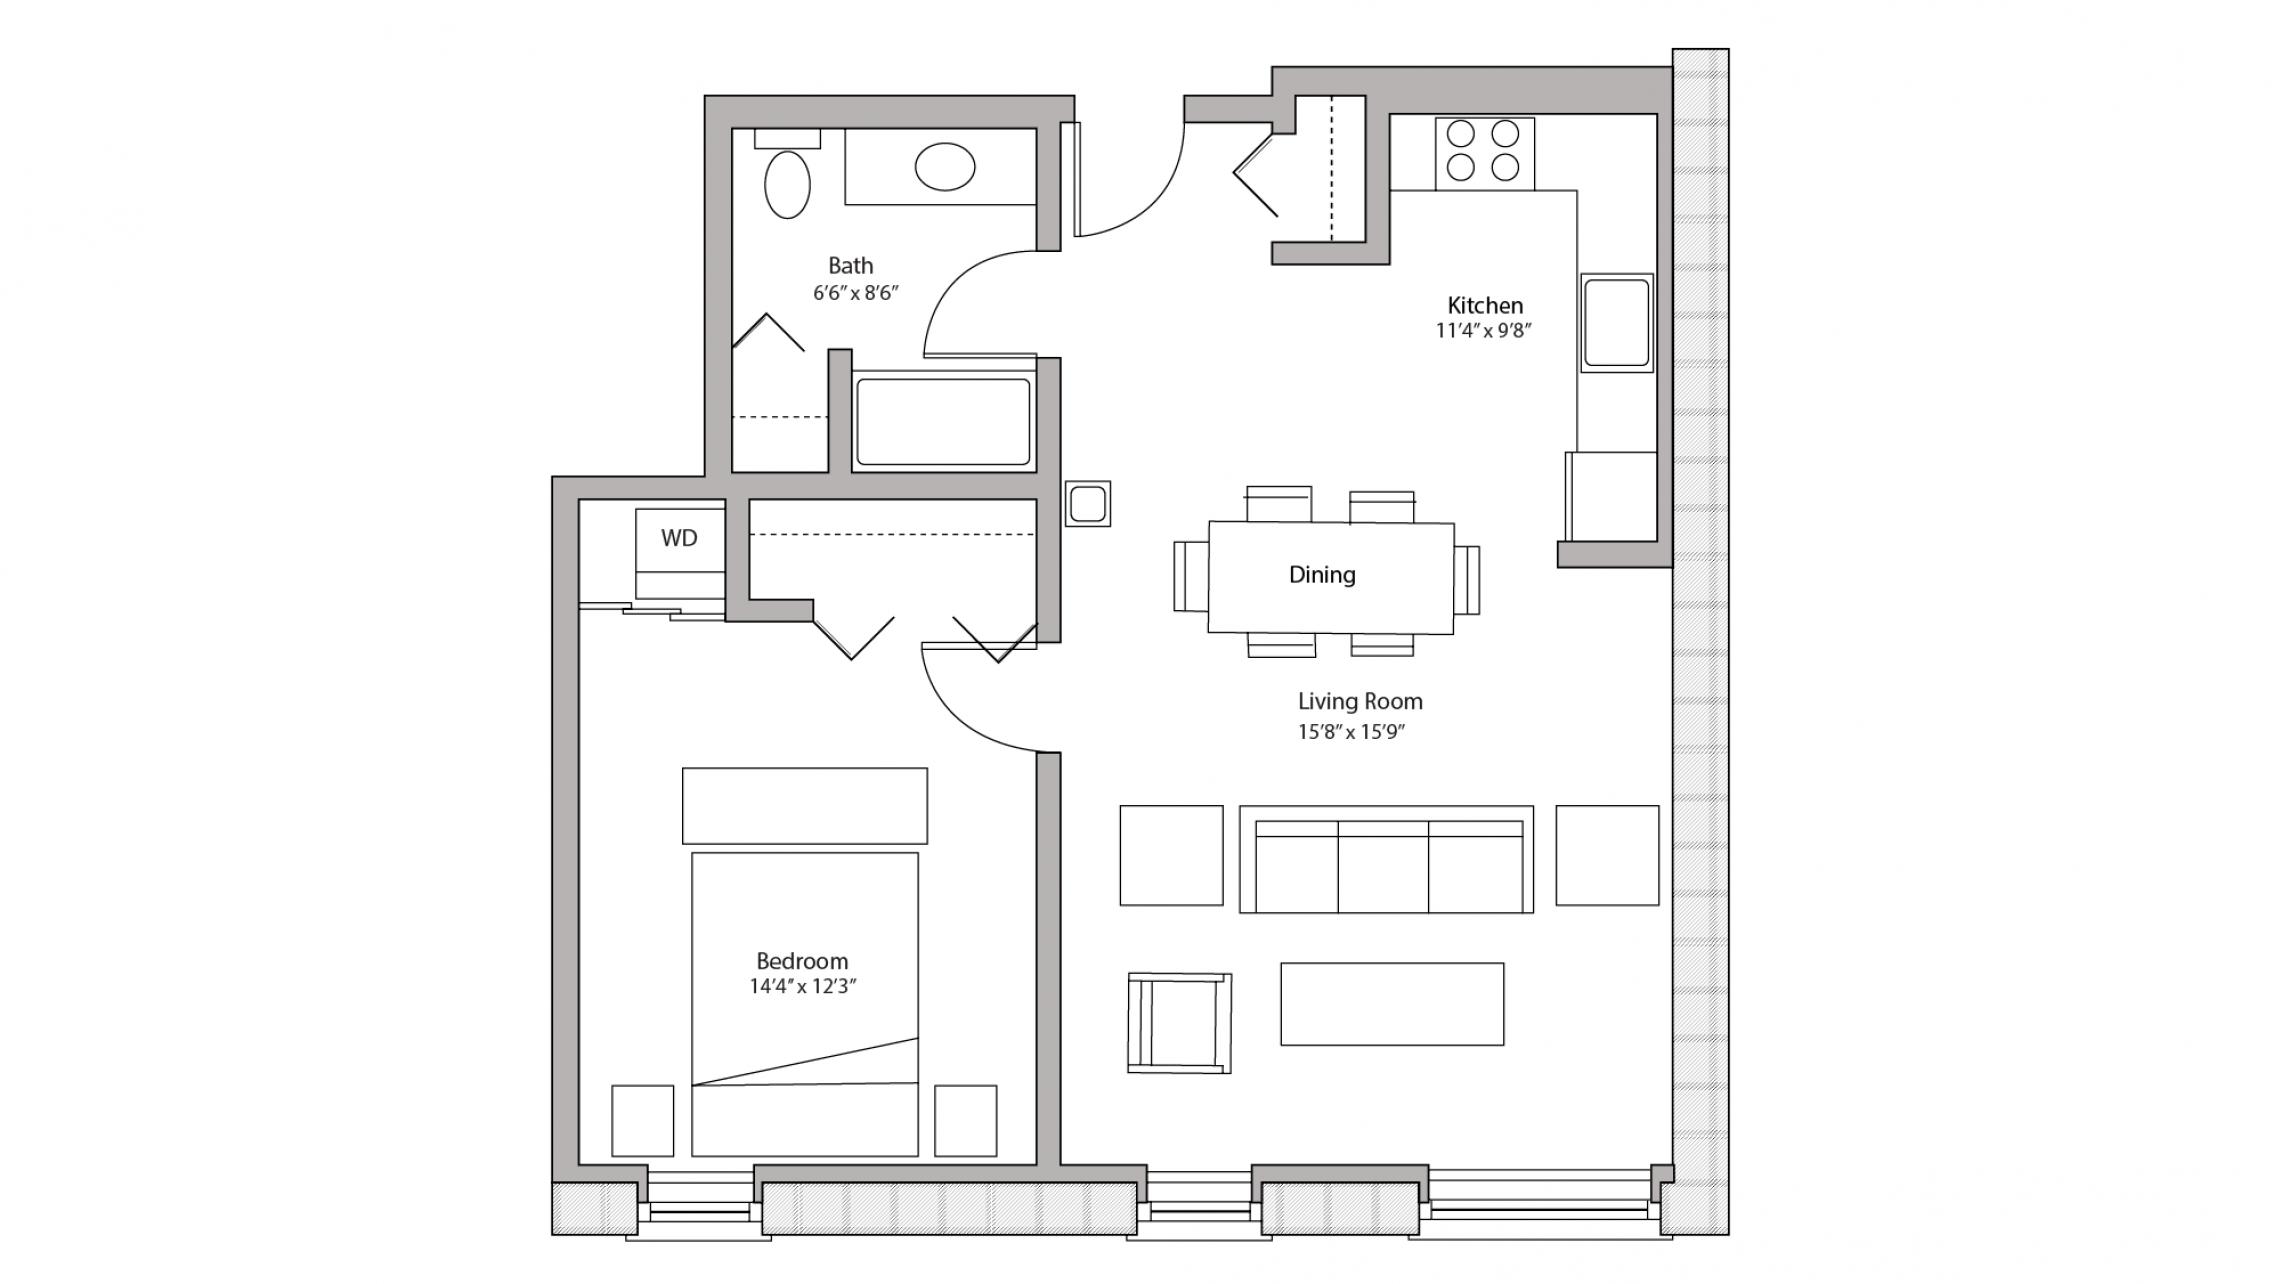 ULI Tobacco Lofts W218 - One Bedroom, One Bathroom